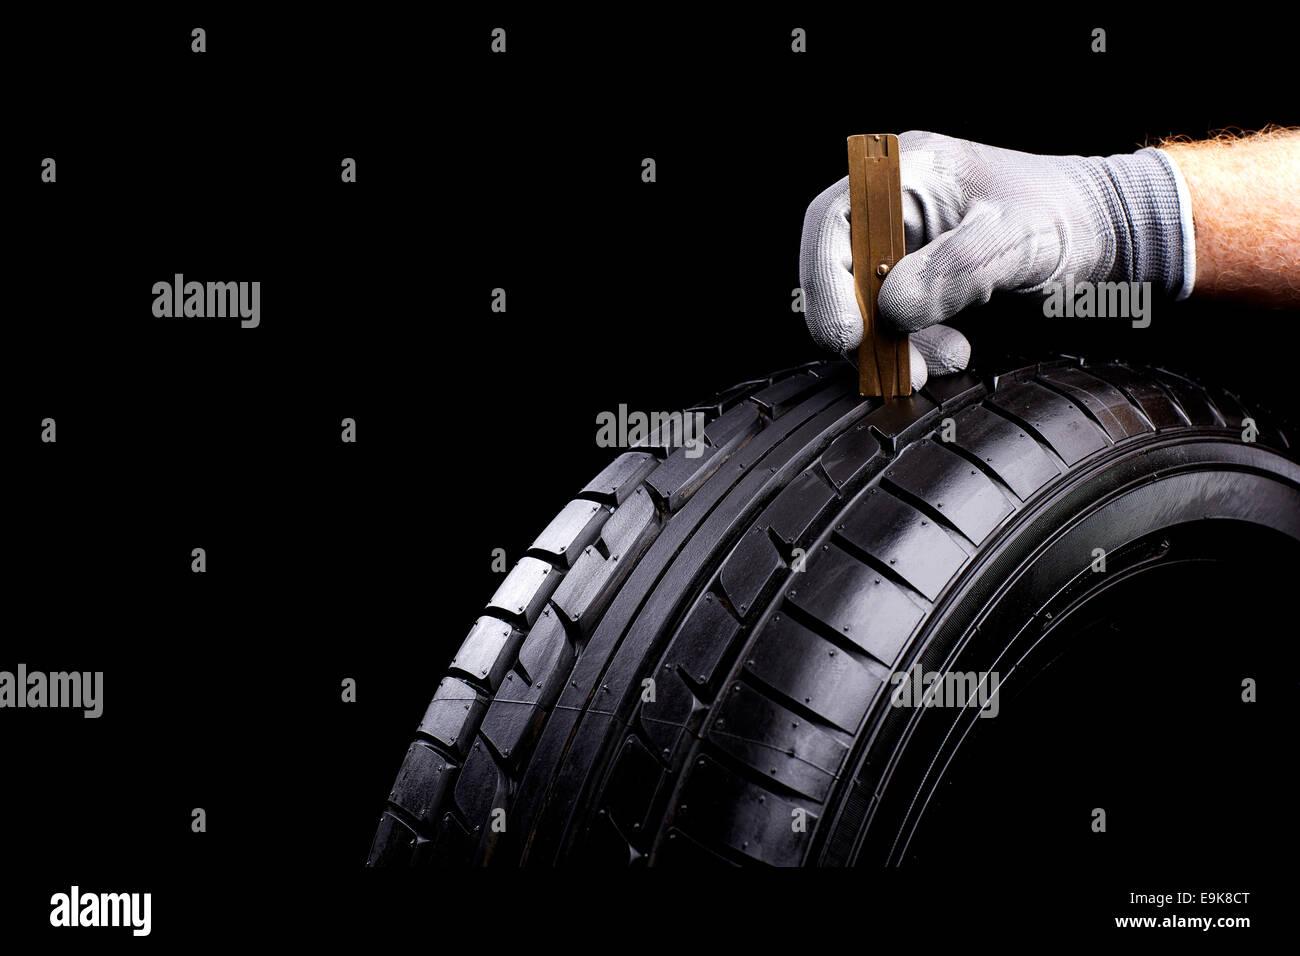 Profil Messen Mit Masstab bin Auto Reifen Stockbild